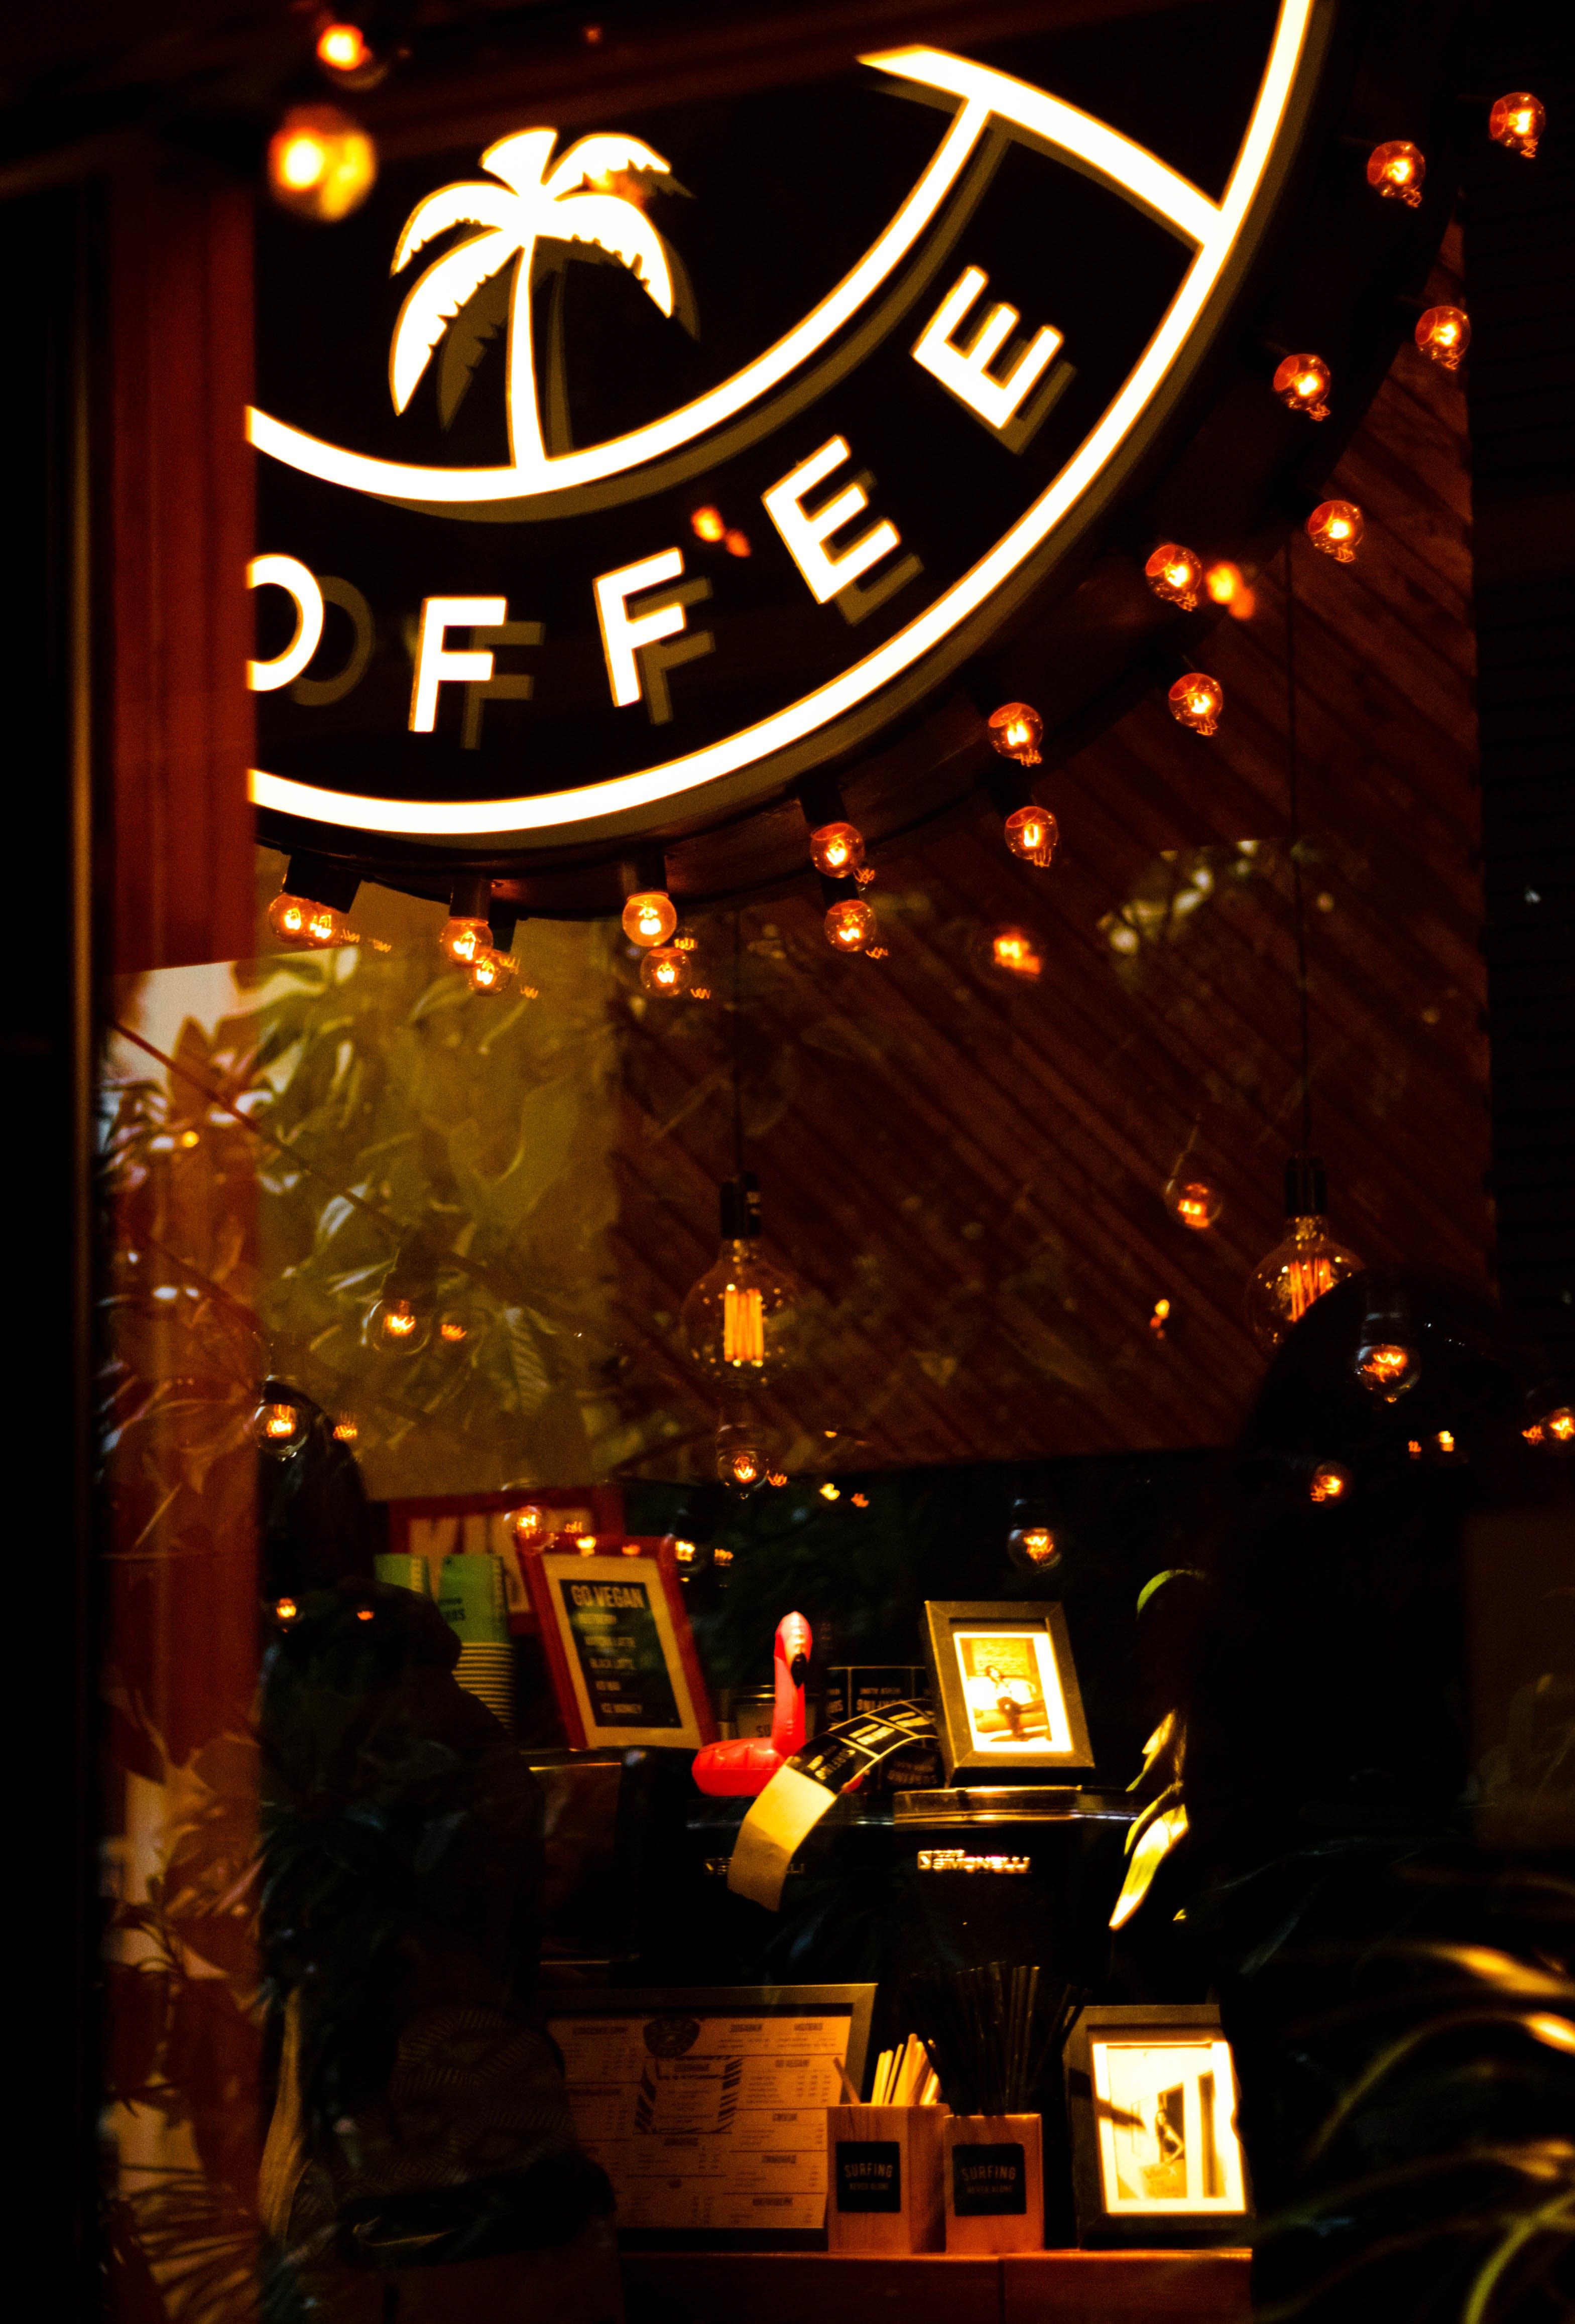 Kostenloses Stock Foto zu abend, bar, beleuchtet, beleuchtung